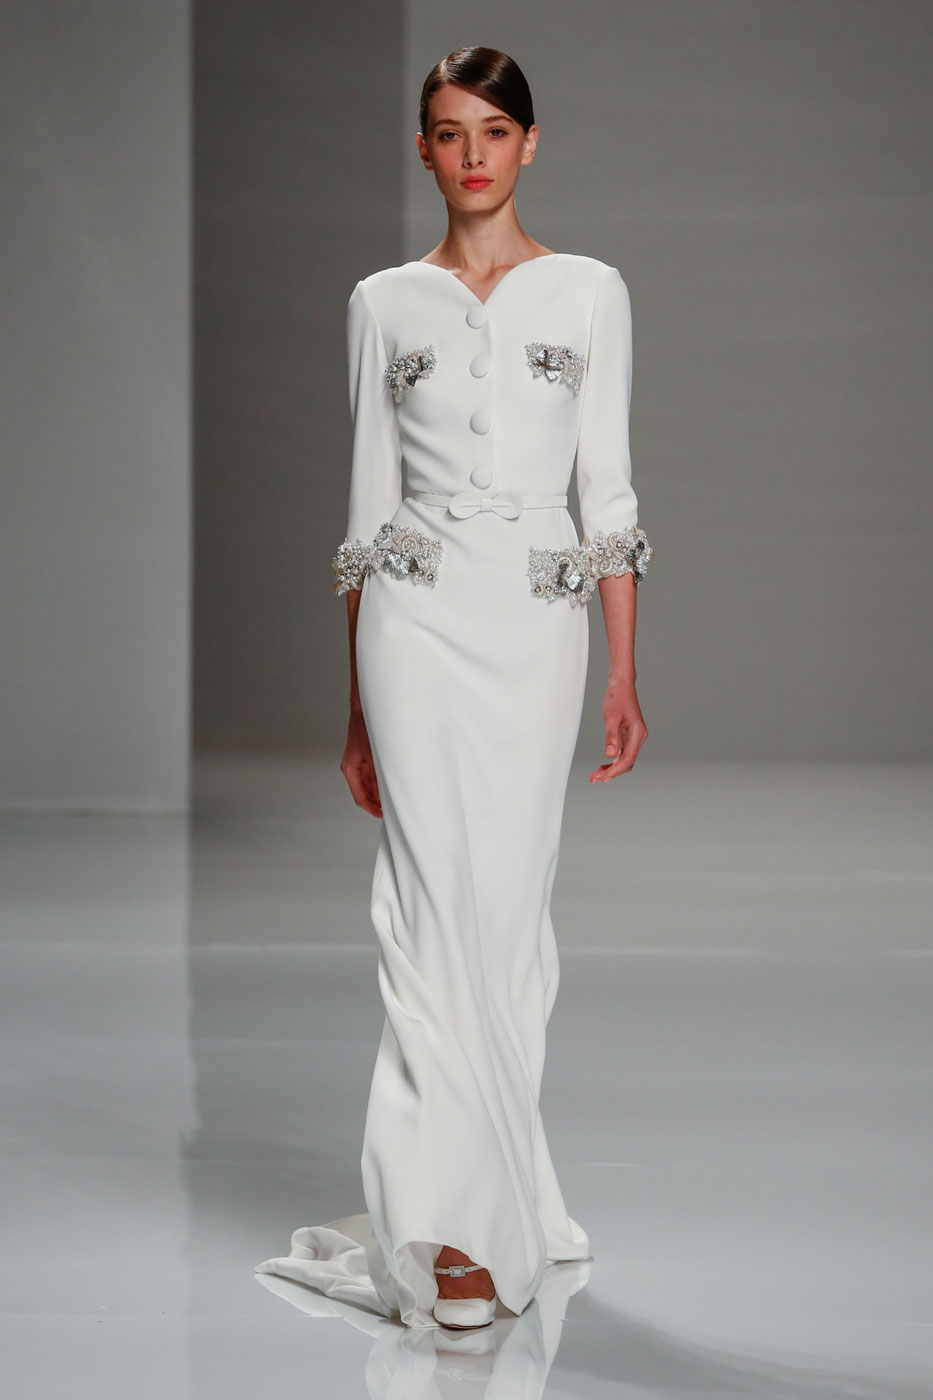 Georges-Hobeika-fashion-runway-show-haute-couture-paris-spring-2015-the-impression-35